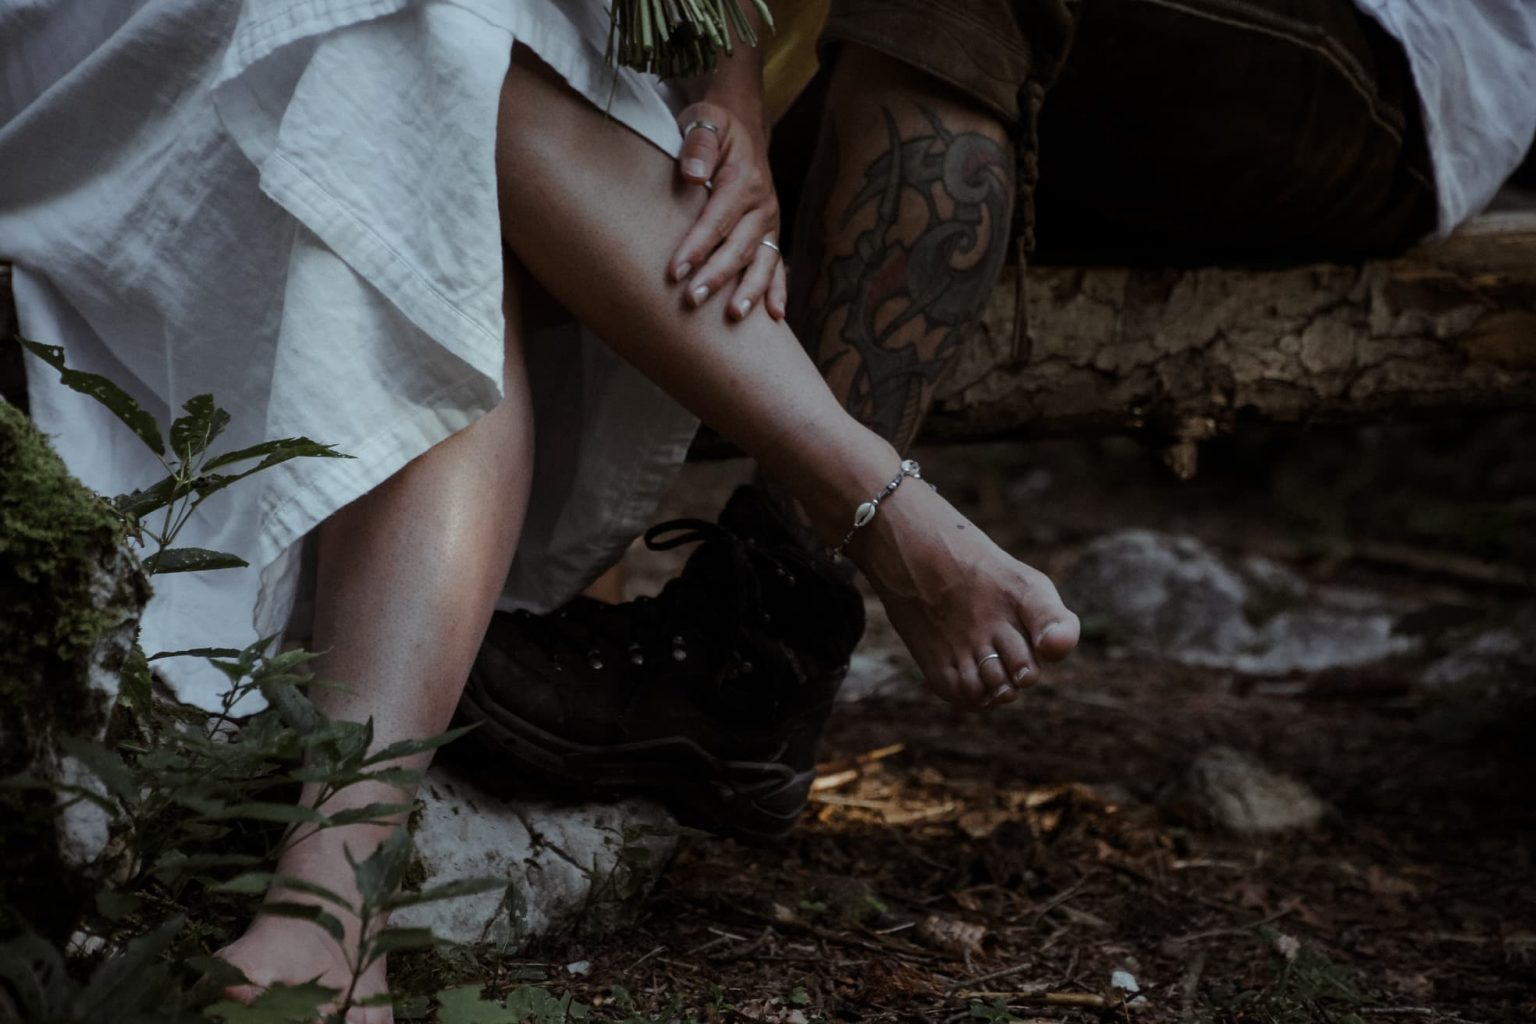 Barfuß, Tattoo, Boots, Elopement